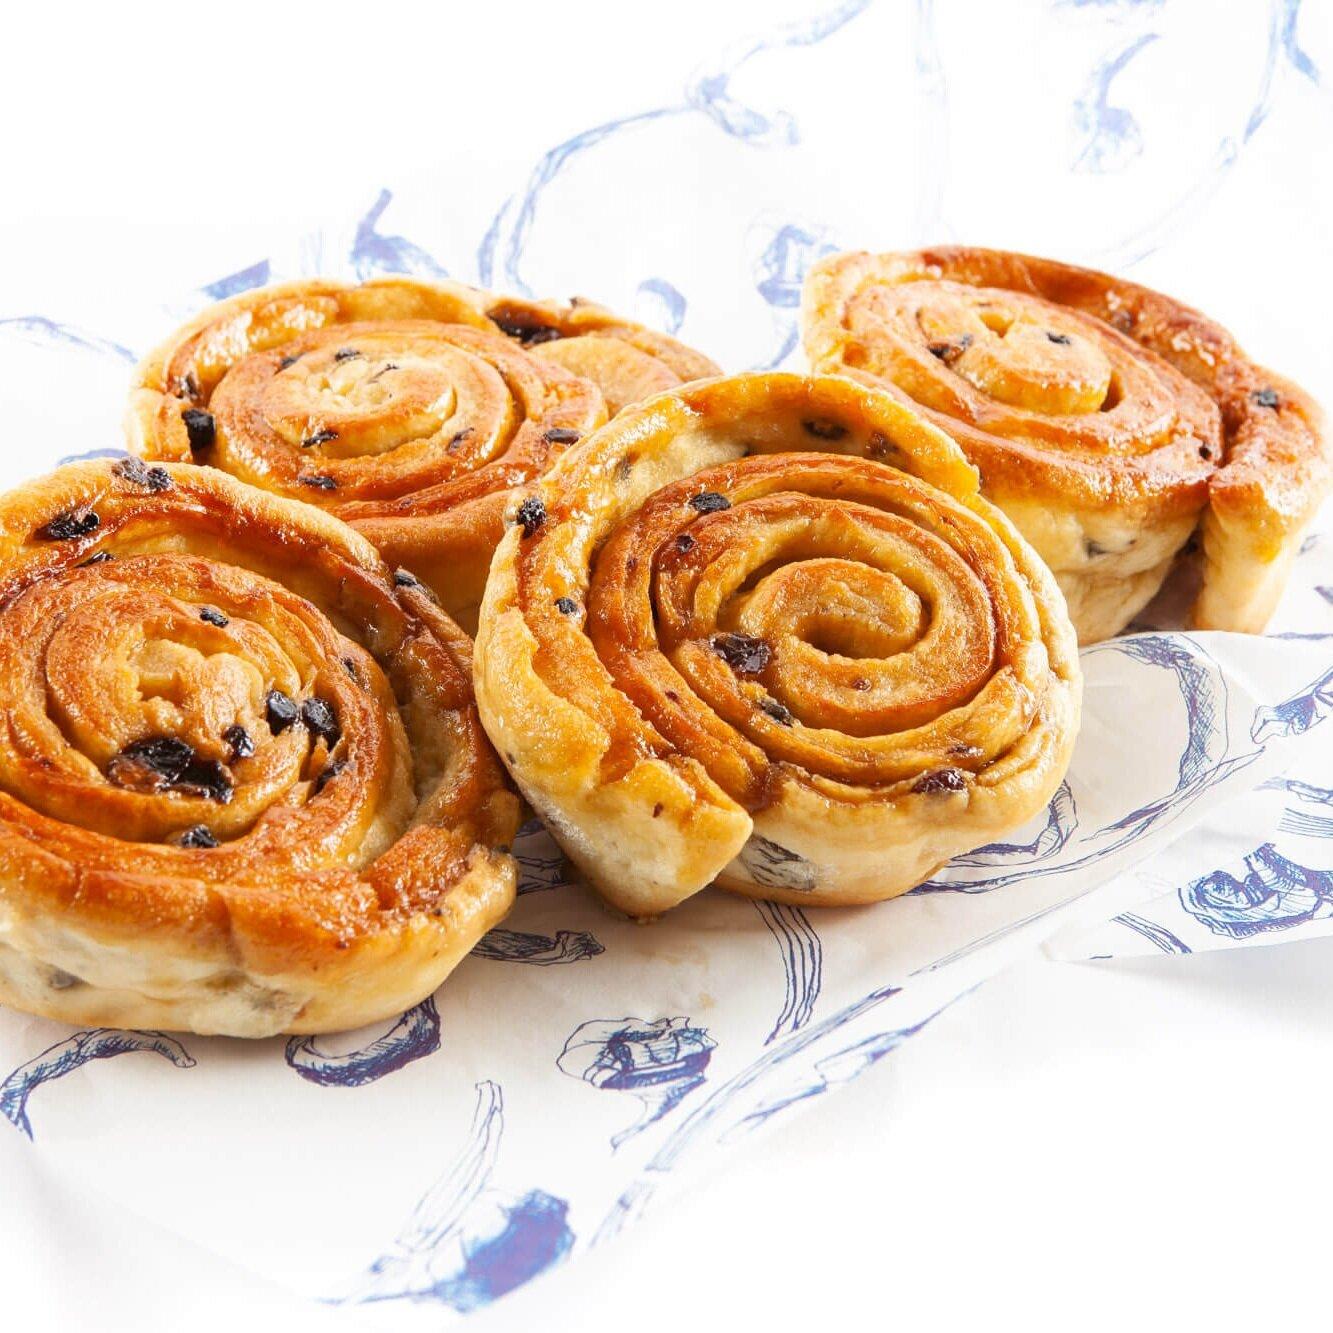 Freshly baked lardy cakes - A gentleman's true calling.